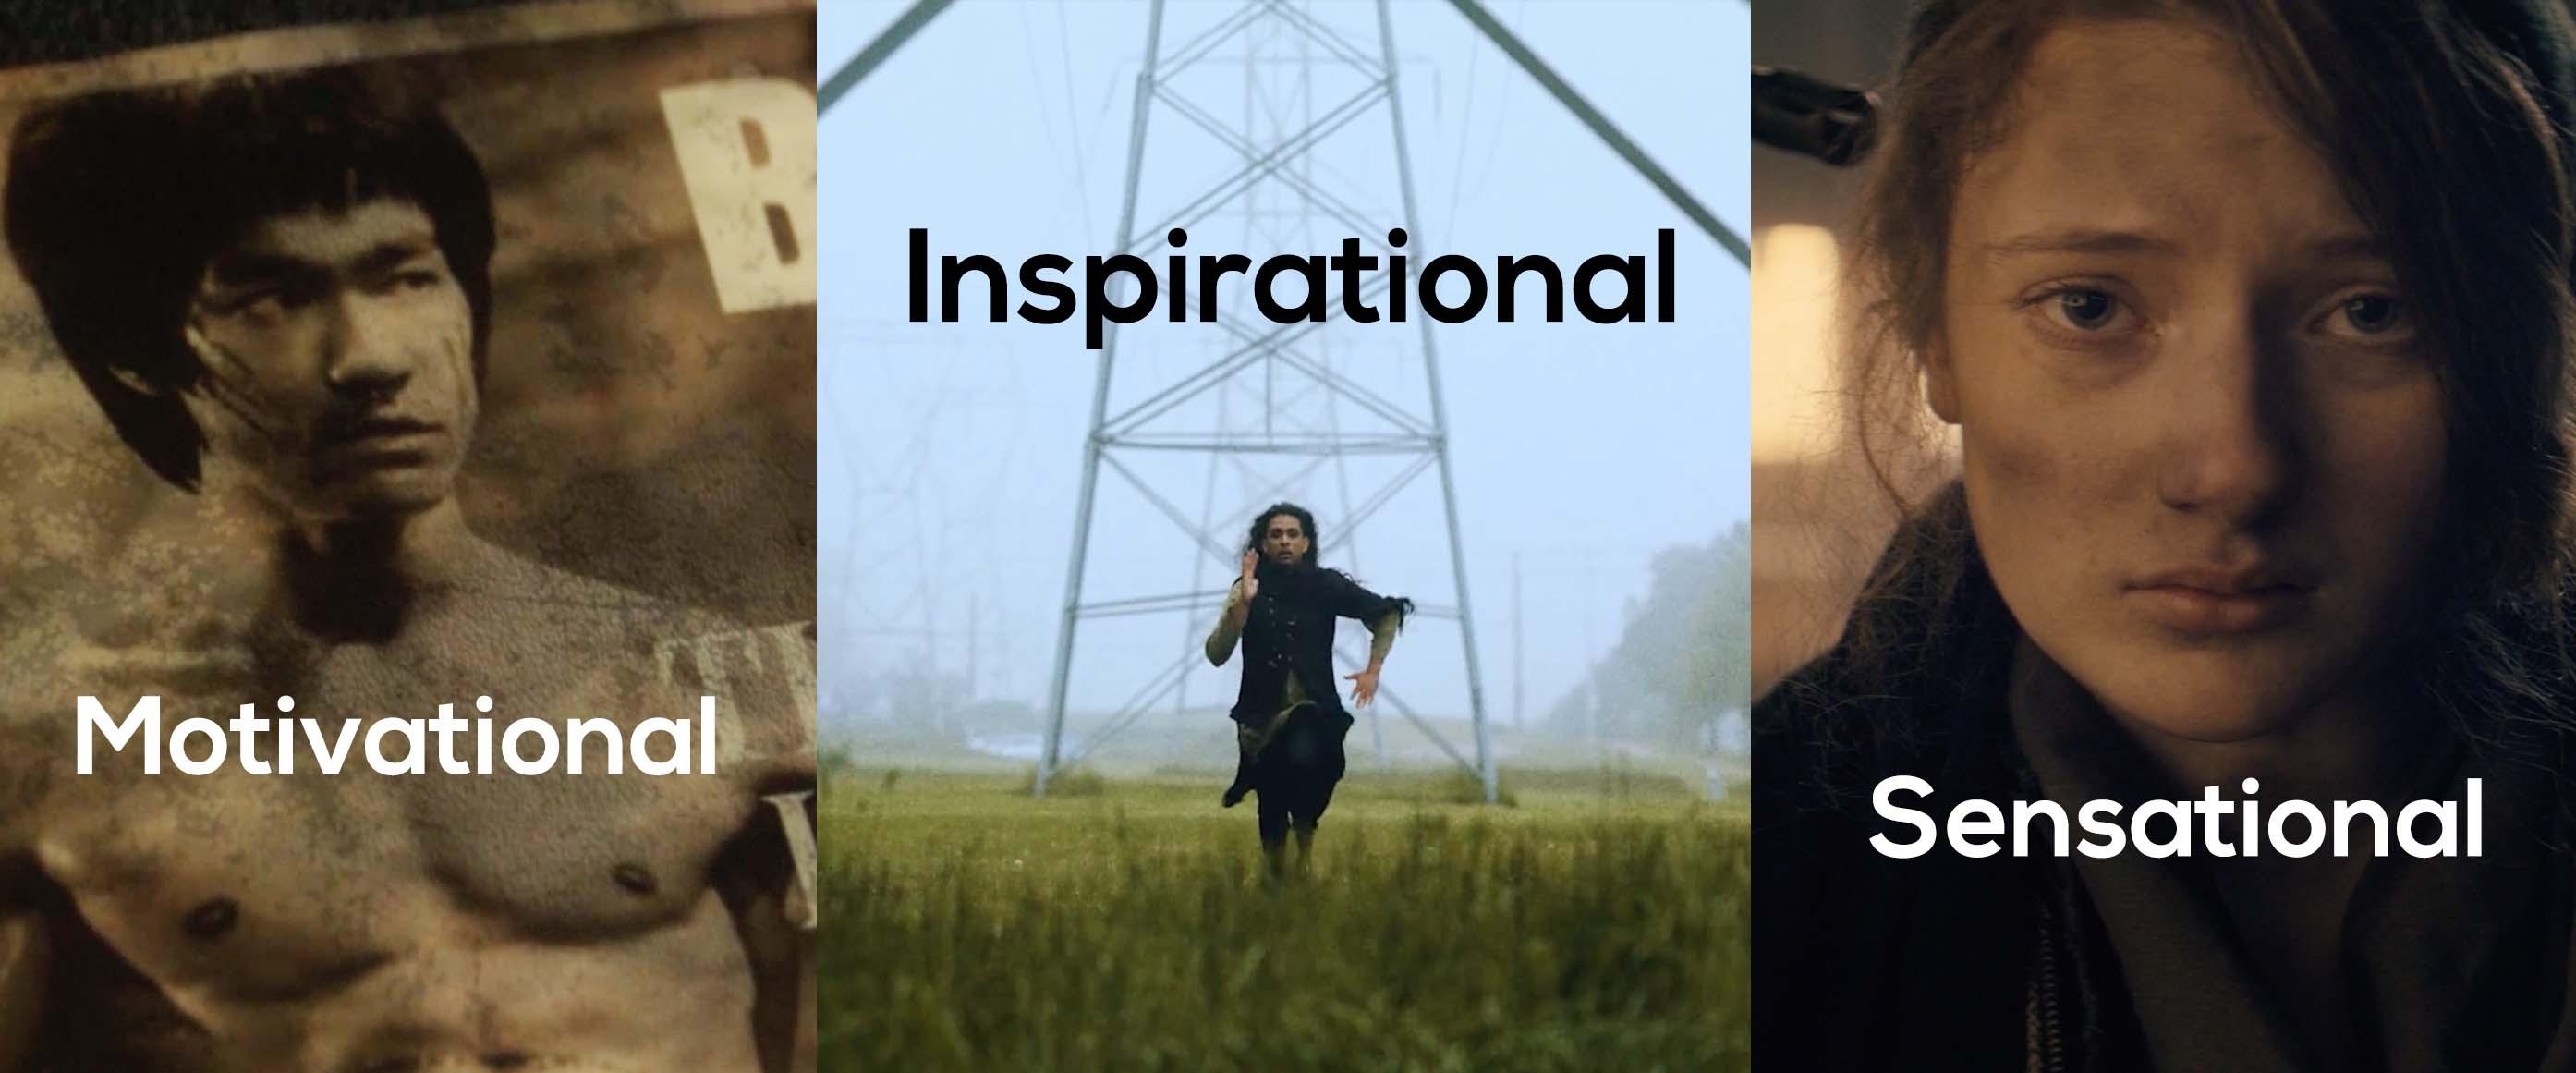 Inspirational Short films post image